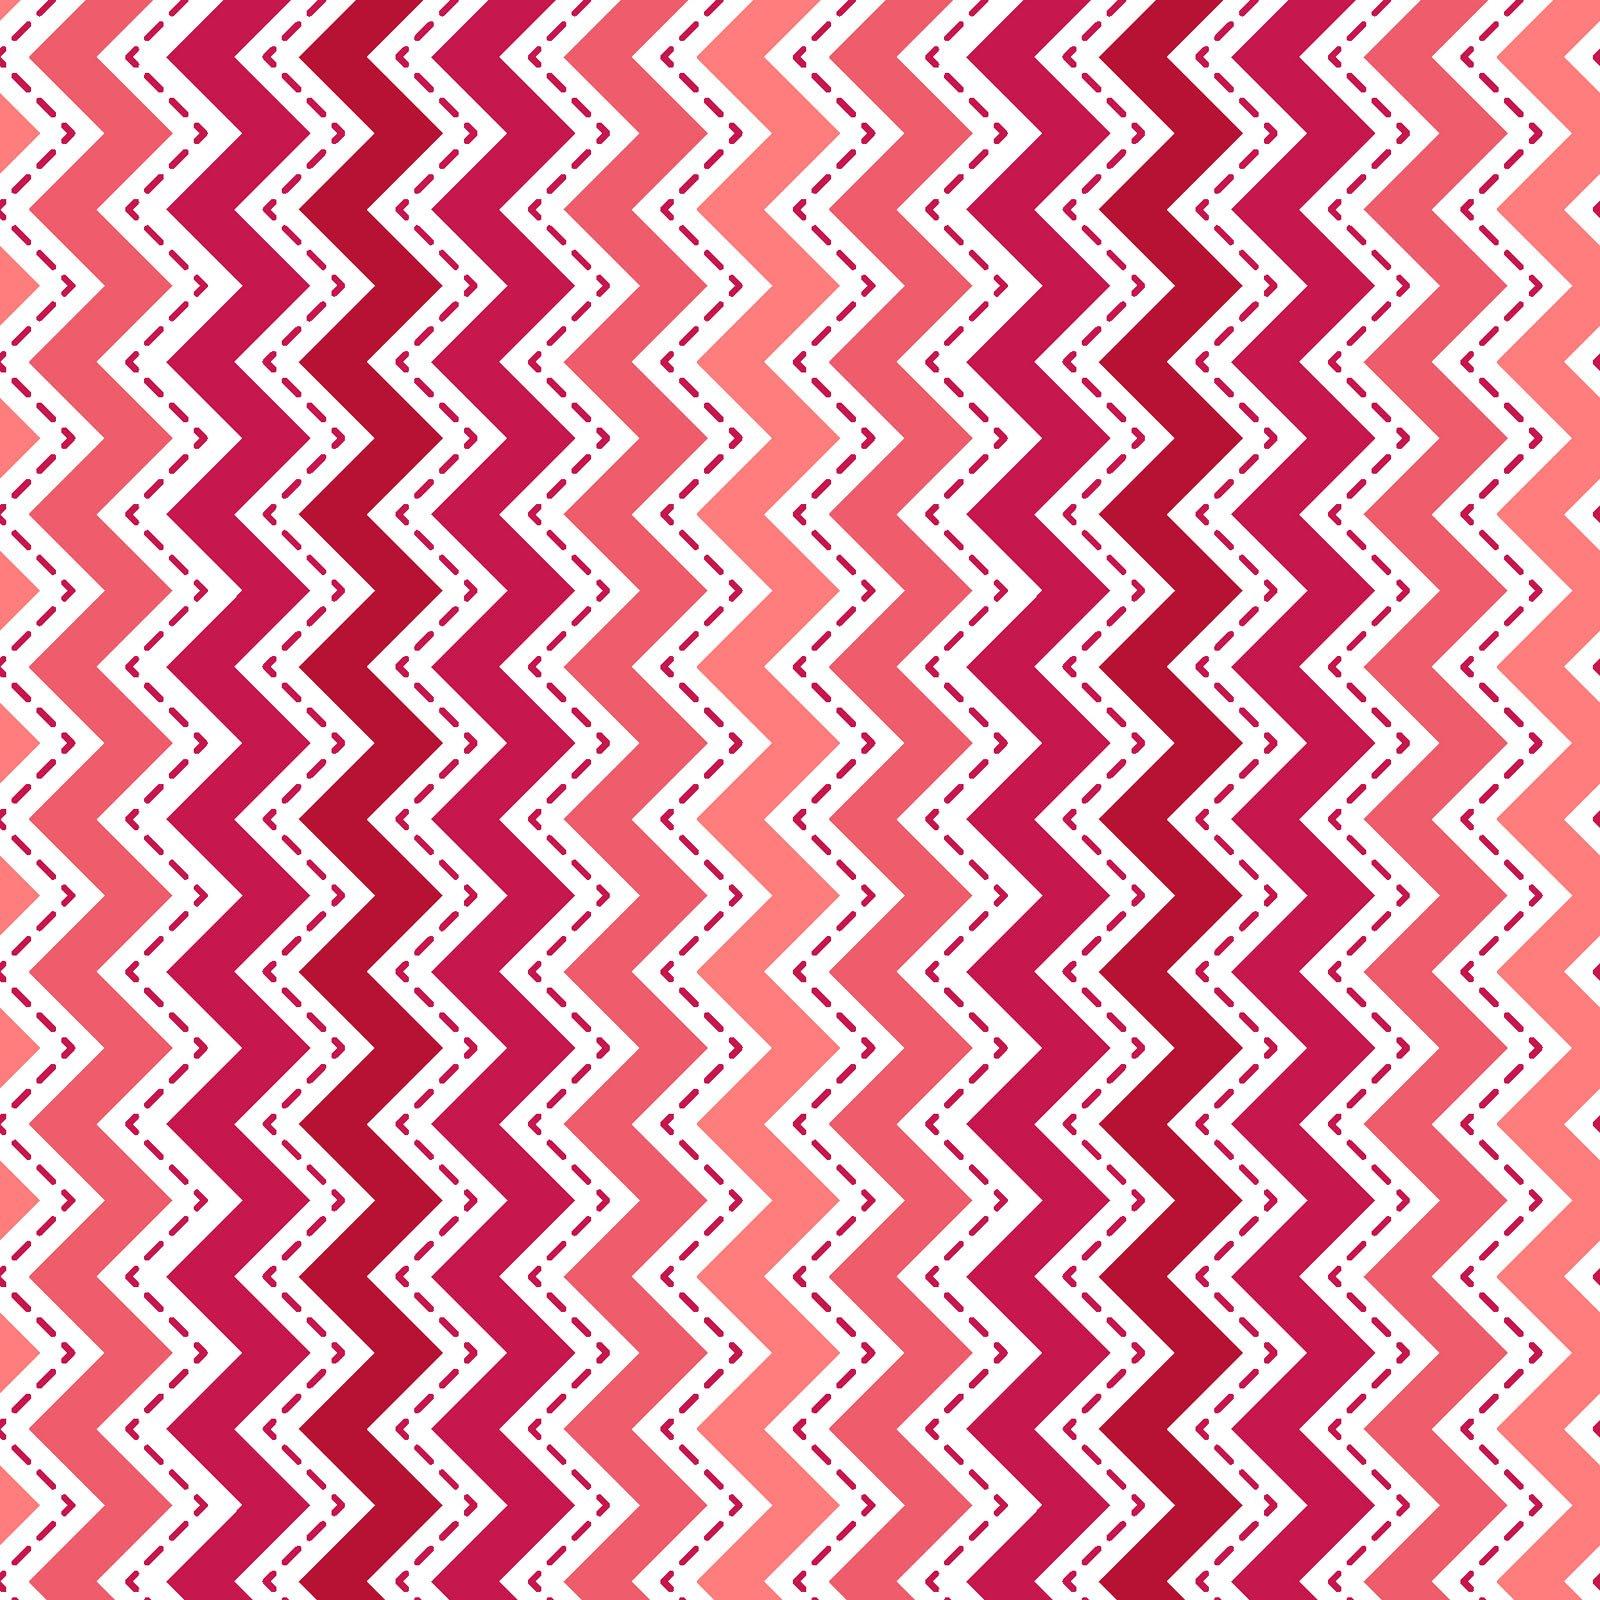 KimberBell Basics Red/Pink Zig Zag 8202M-RP